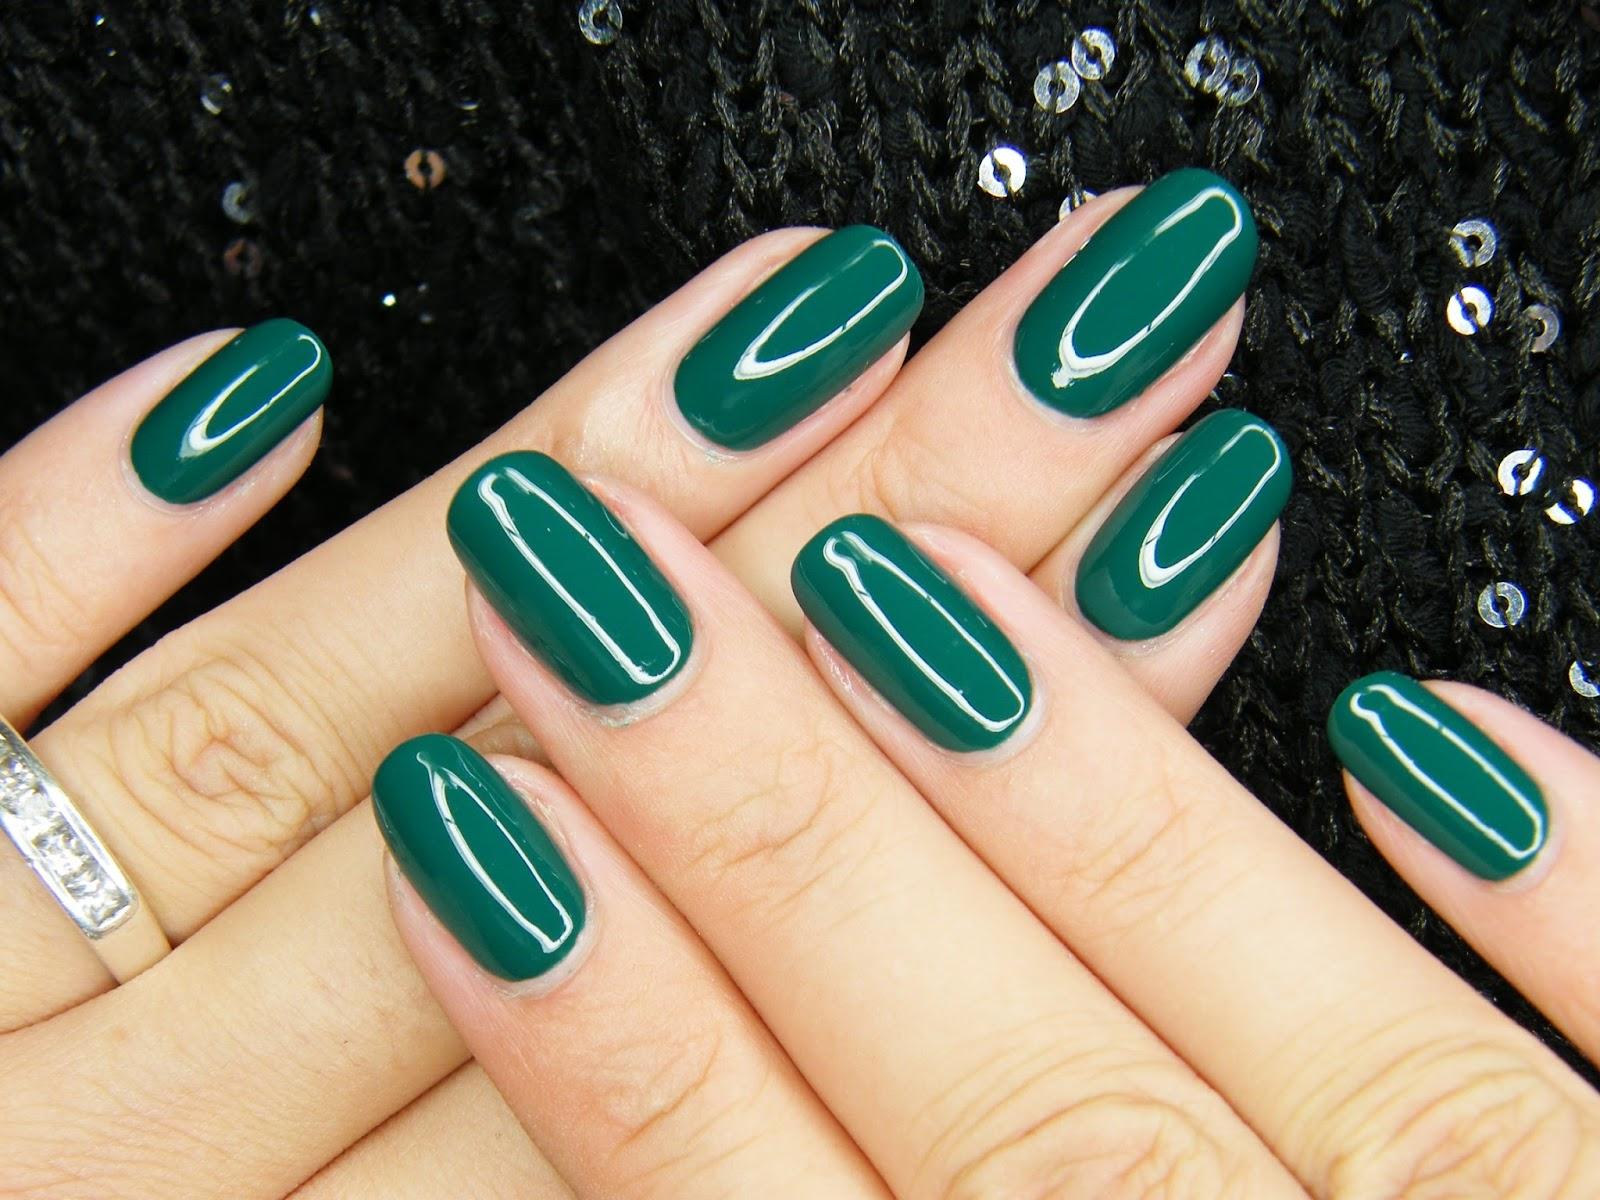 Nails Revolutions By Alicja Fik Butelkowa Zieleń